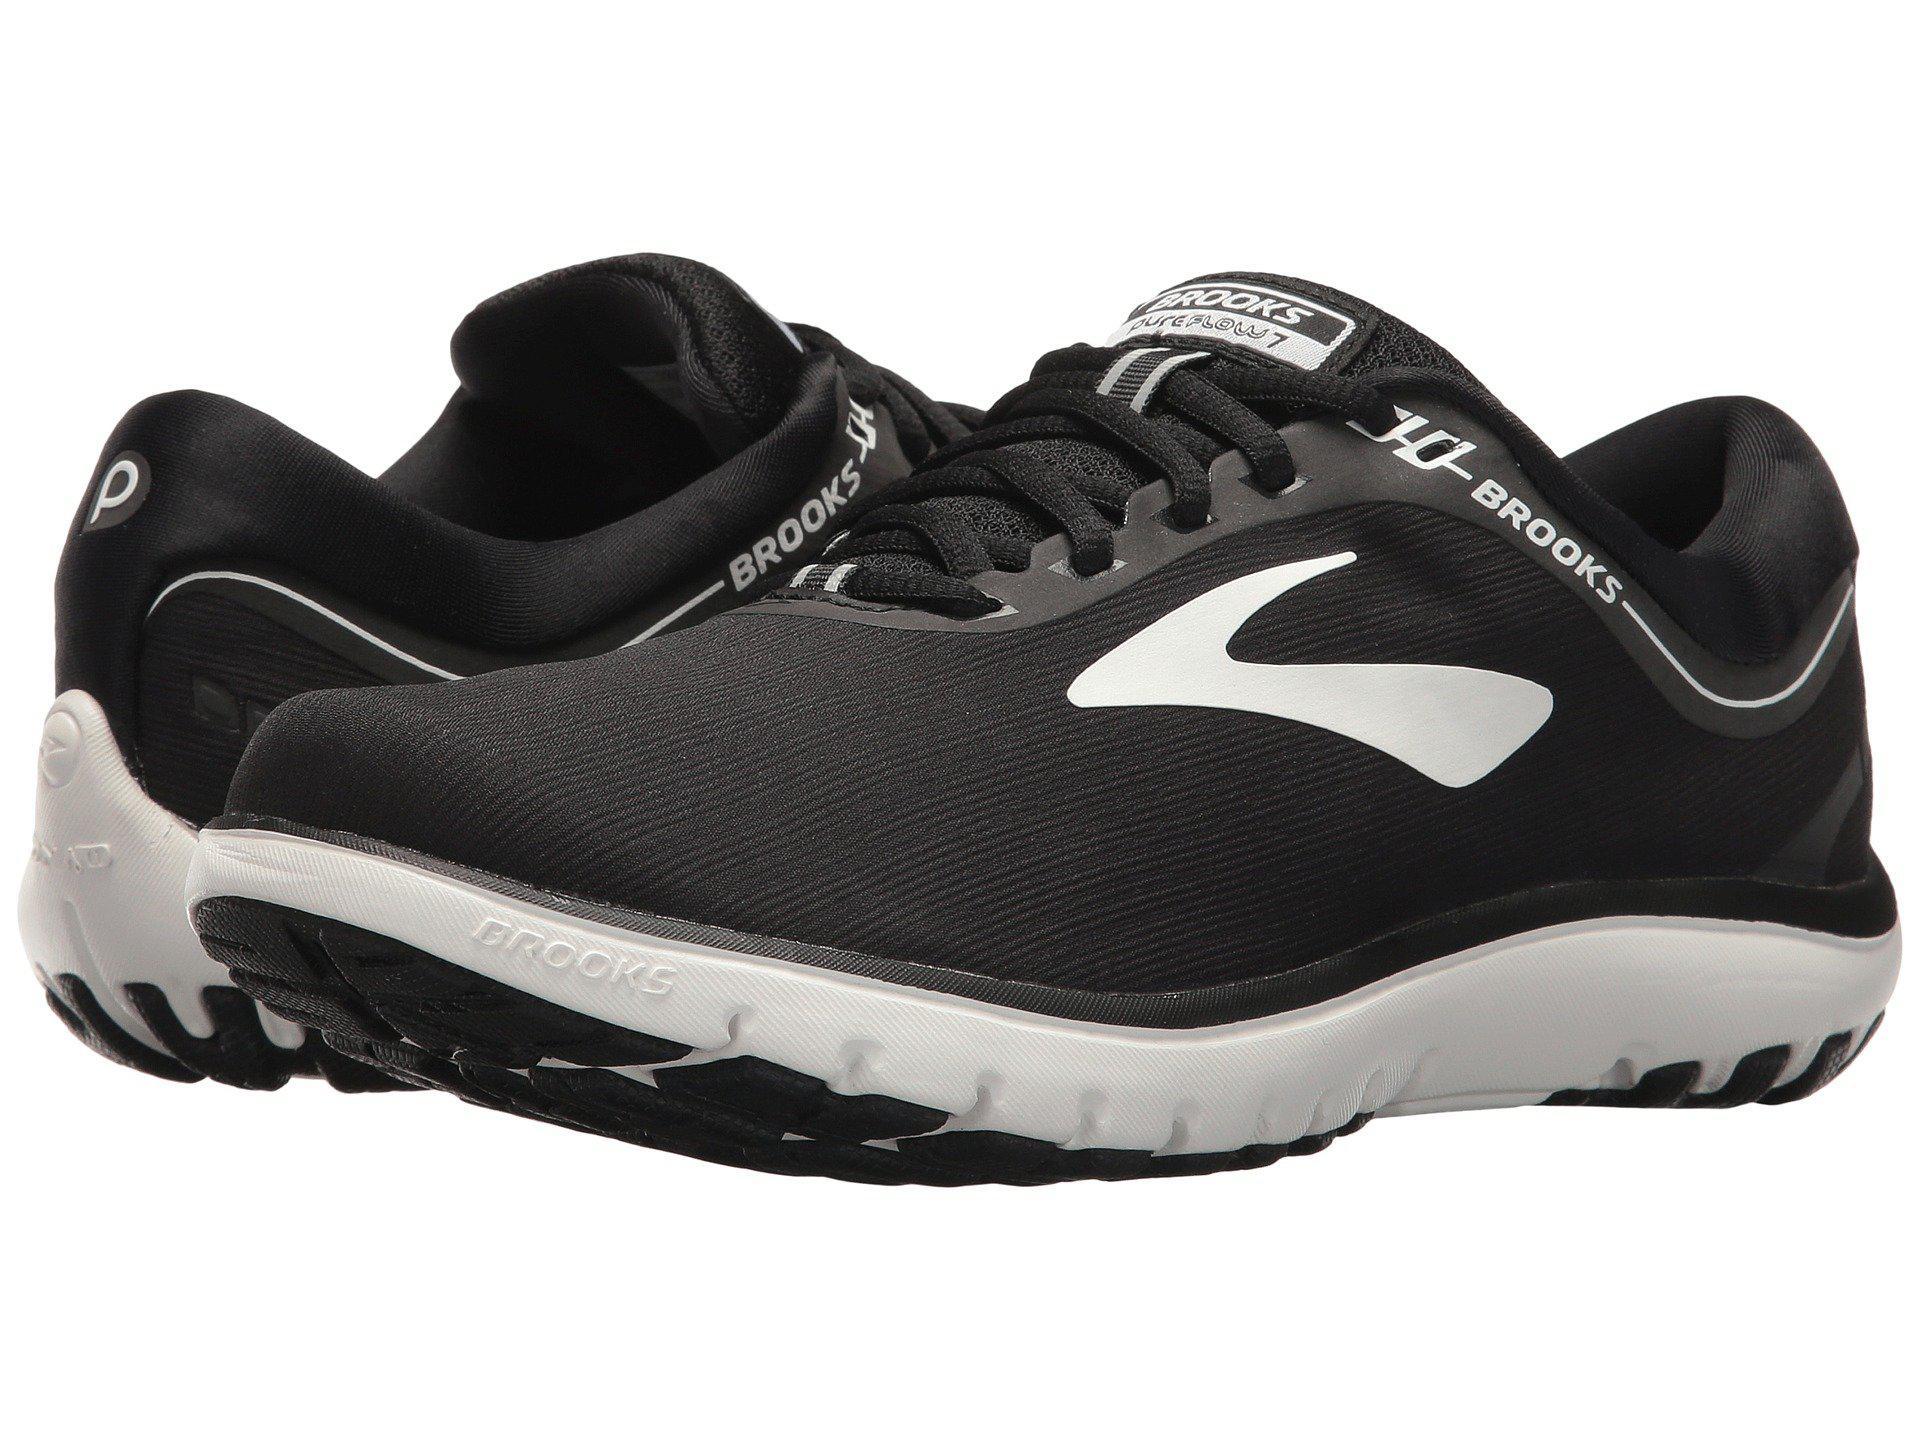 18fa03ddbec3b Lyst - Brooks Pureflow 7 (grey black green) Women s Running Shoes in ...